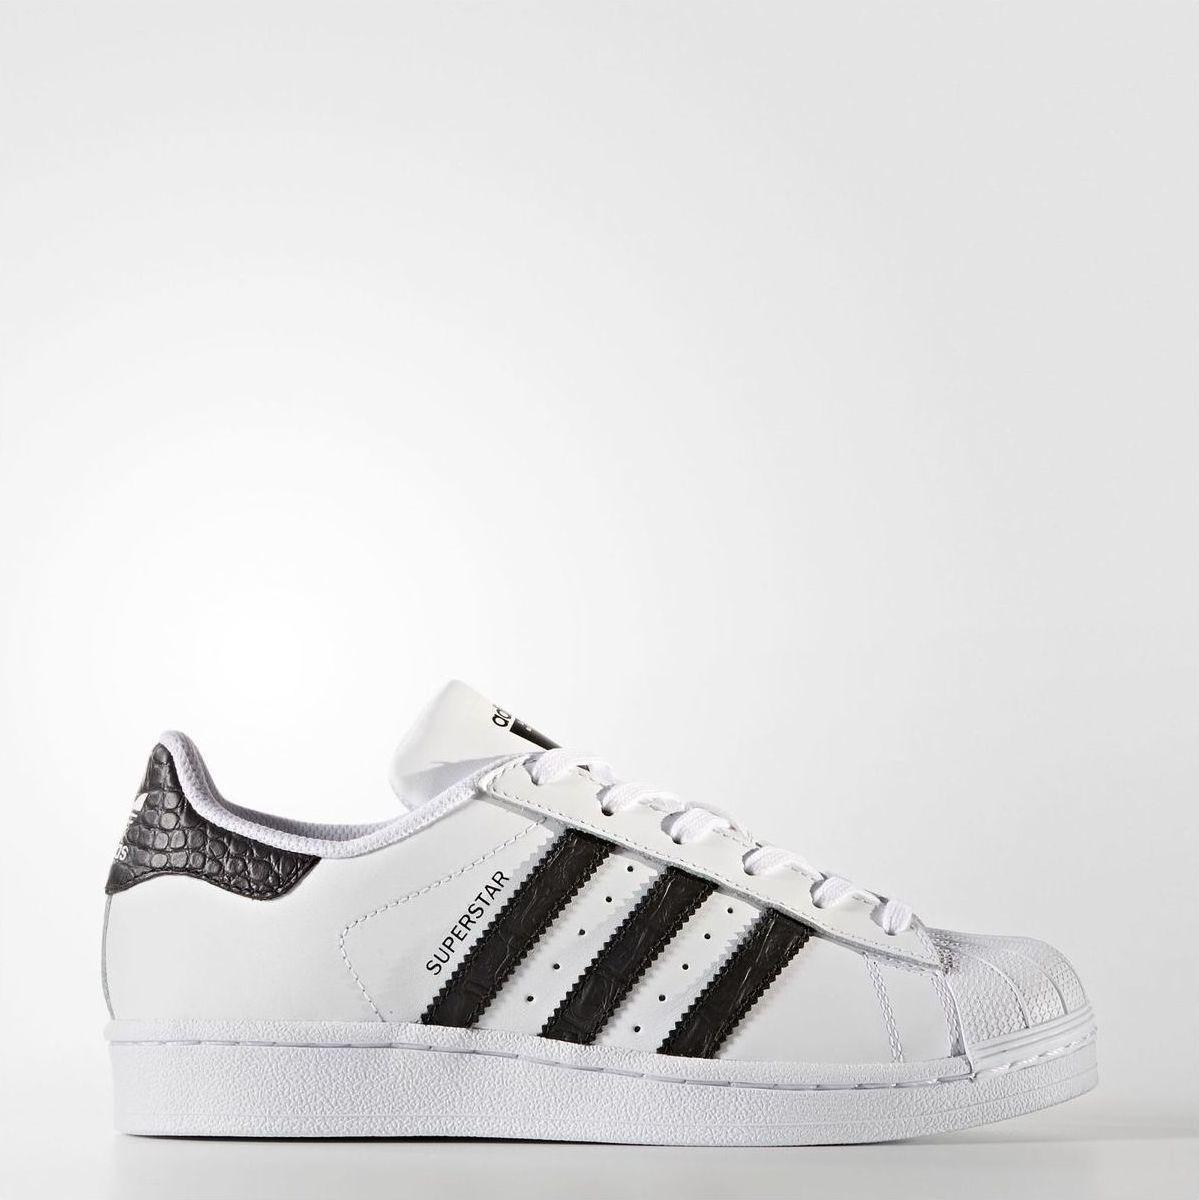 ... 280be4ffd09b Προσθήκη στα αγαπημένα menu Adidas Superstar J BZ0362. Adidas  Superstar J BZ0362 . aad5756e875